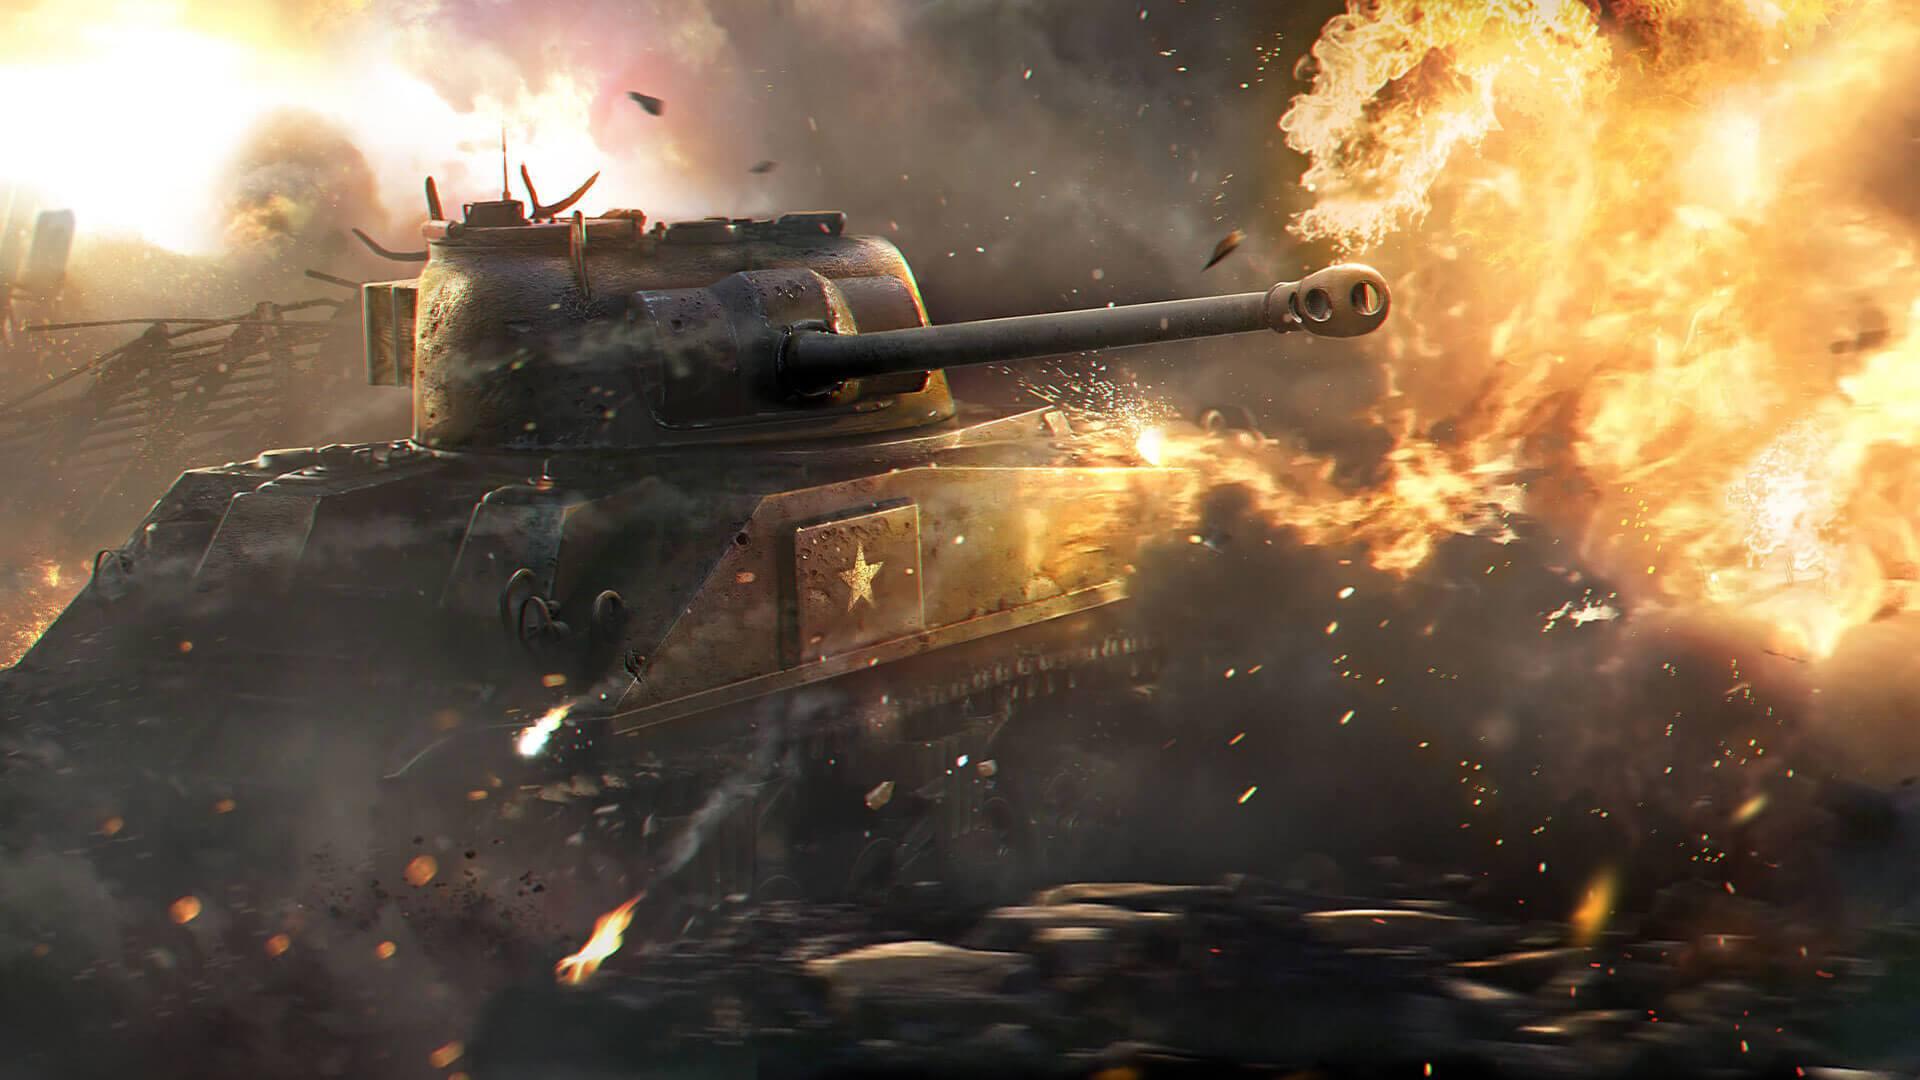 free download tank war games full version for pc